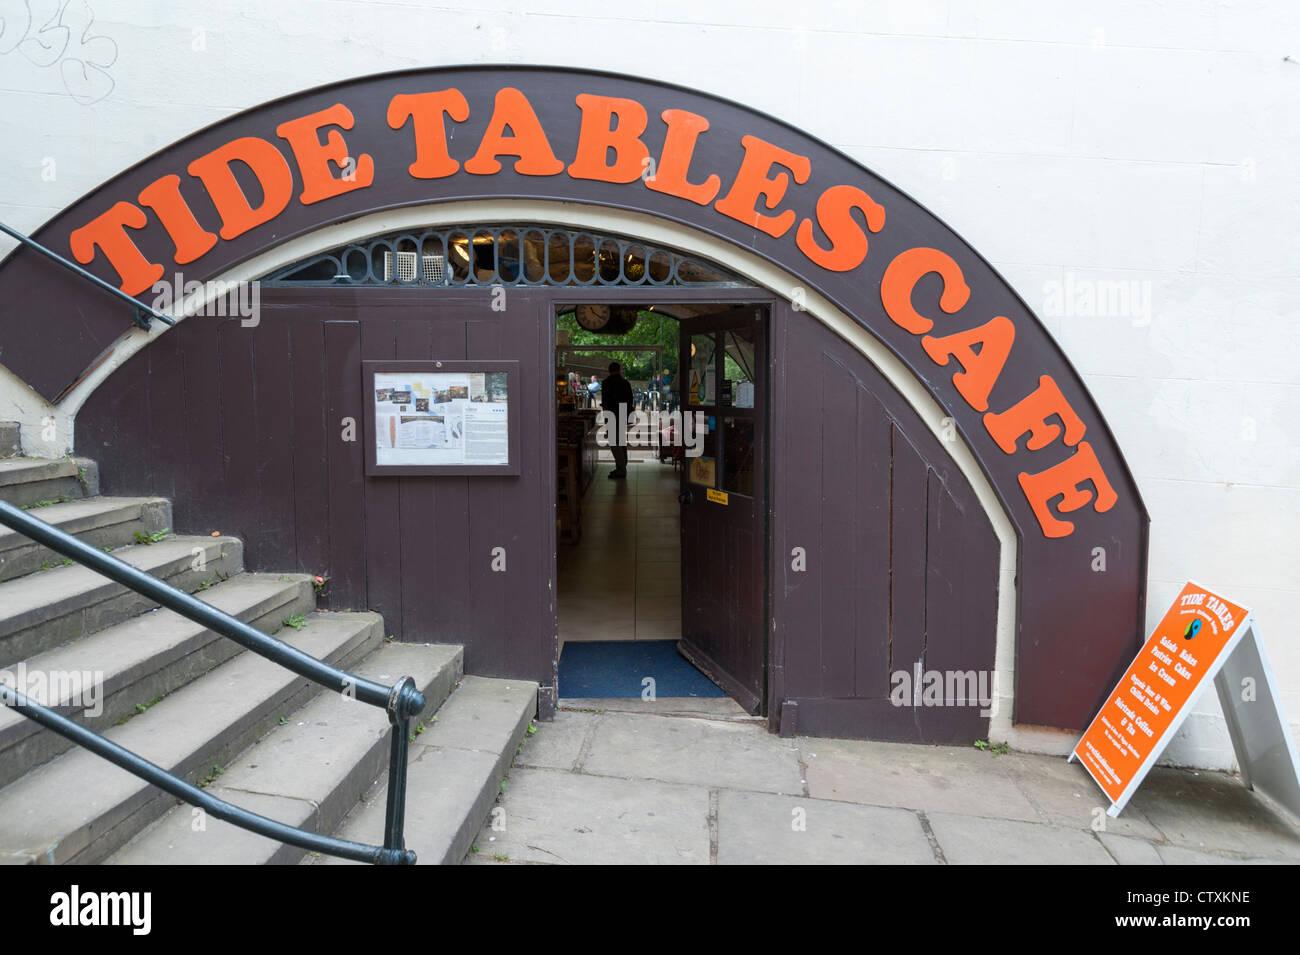 Tide table cafe richmond upon thames london uk stock photo tide table cafe richmond upon thames london uk nvjuhfo Choice Image